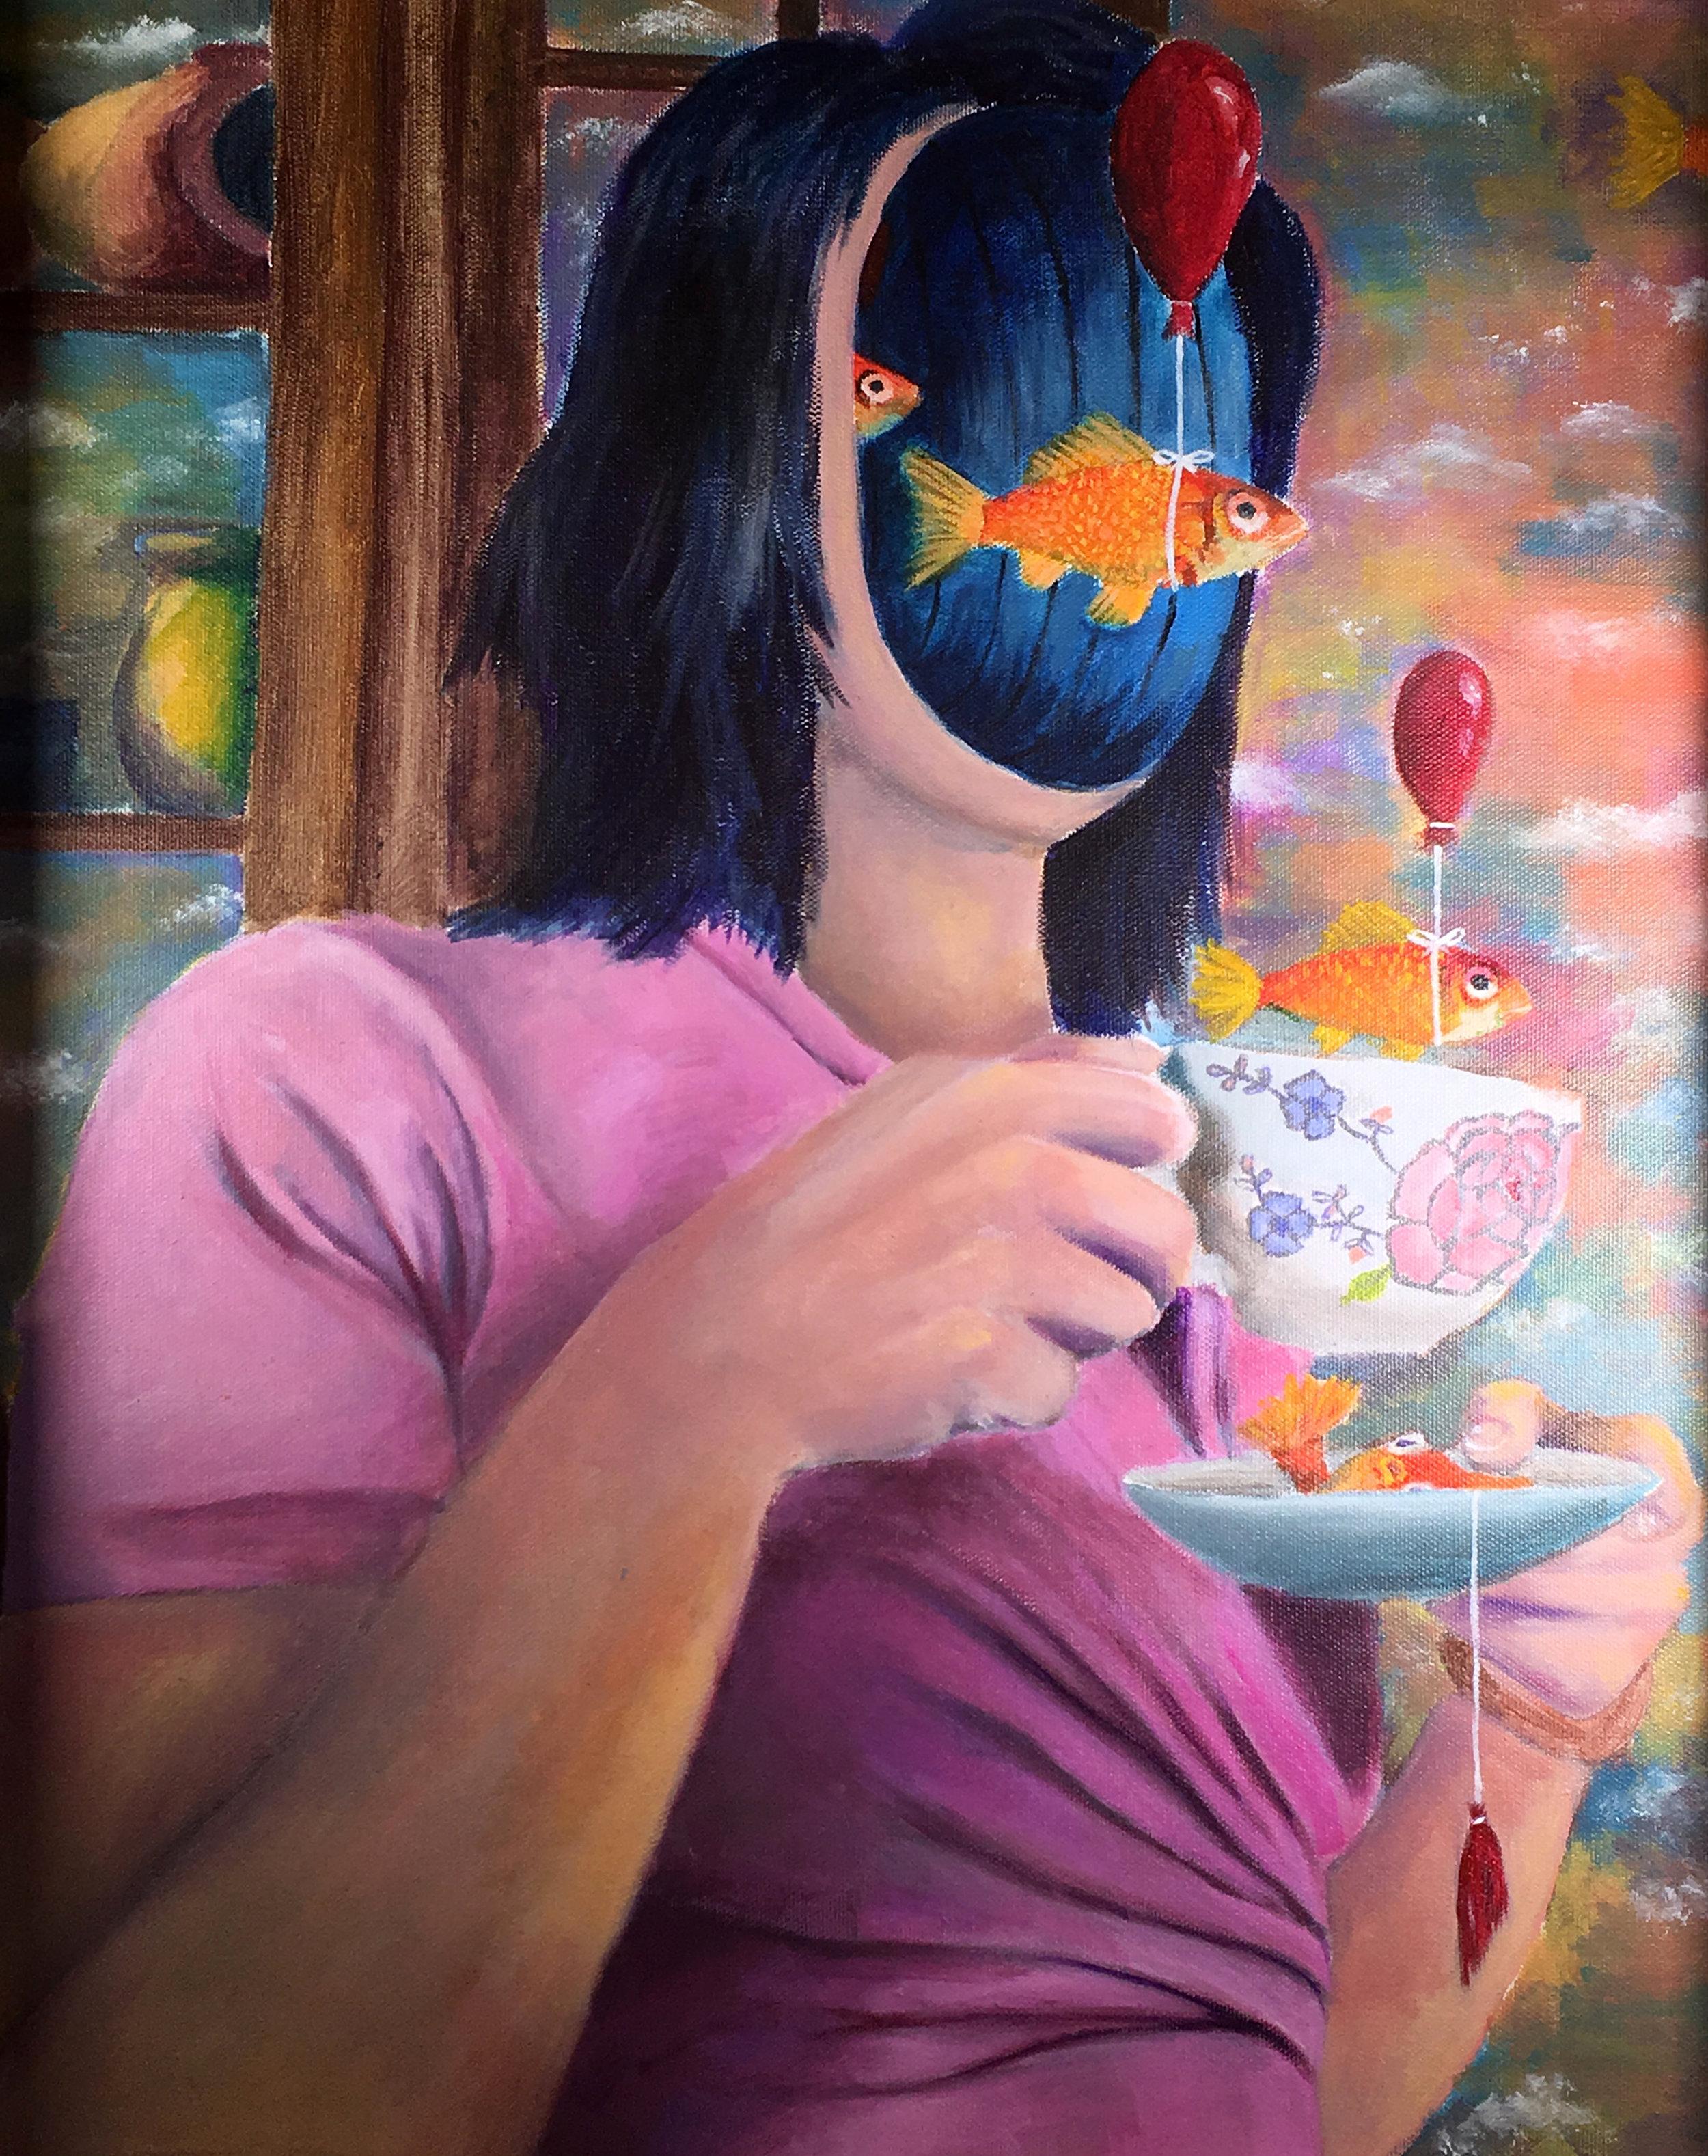 Natalie Rybale  Not My Cup of Tea Acrylic  Bridgewater Raritan High School 21.5x17.5 Somerset County